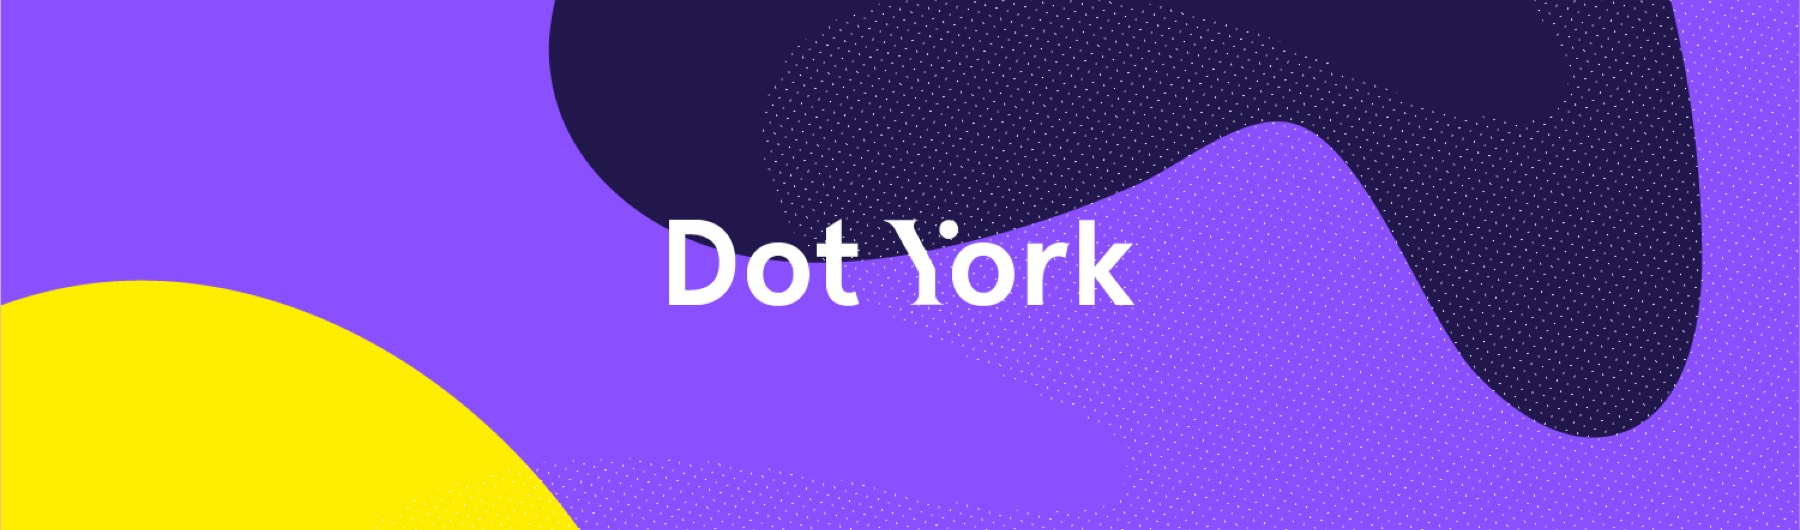 Dot York 2018